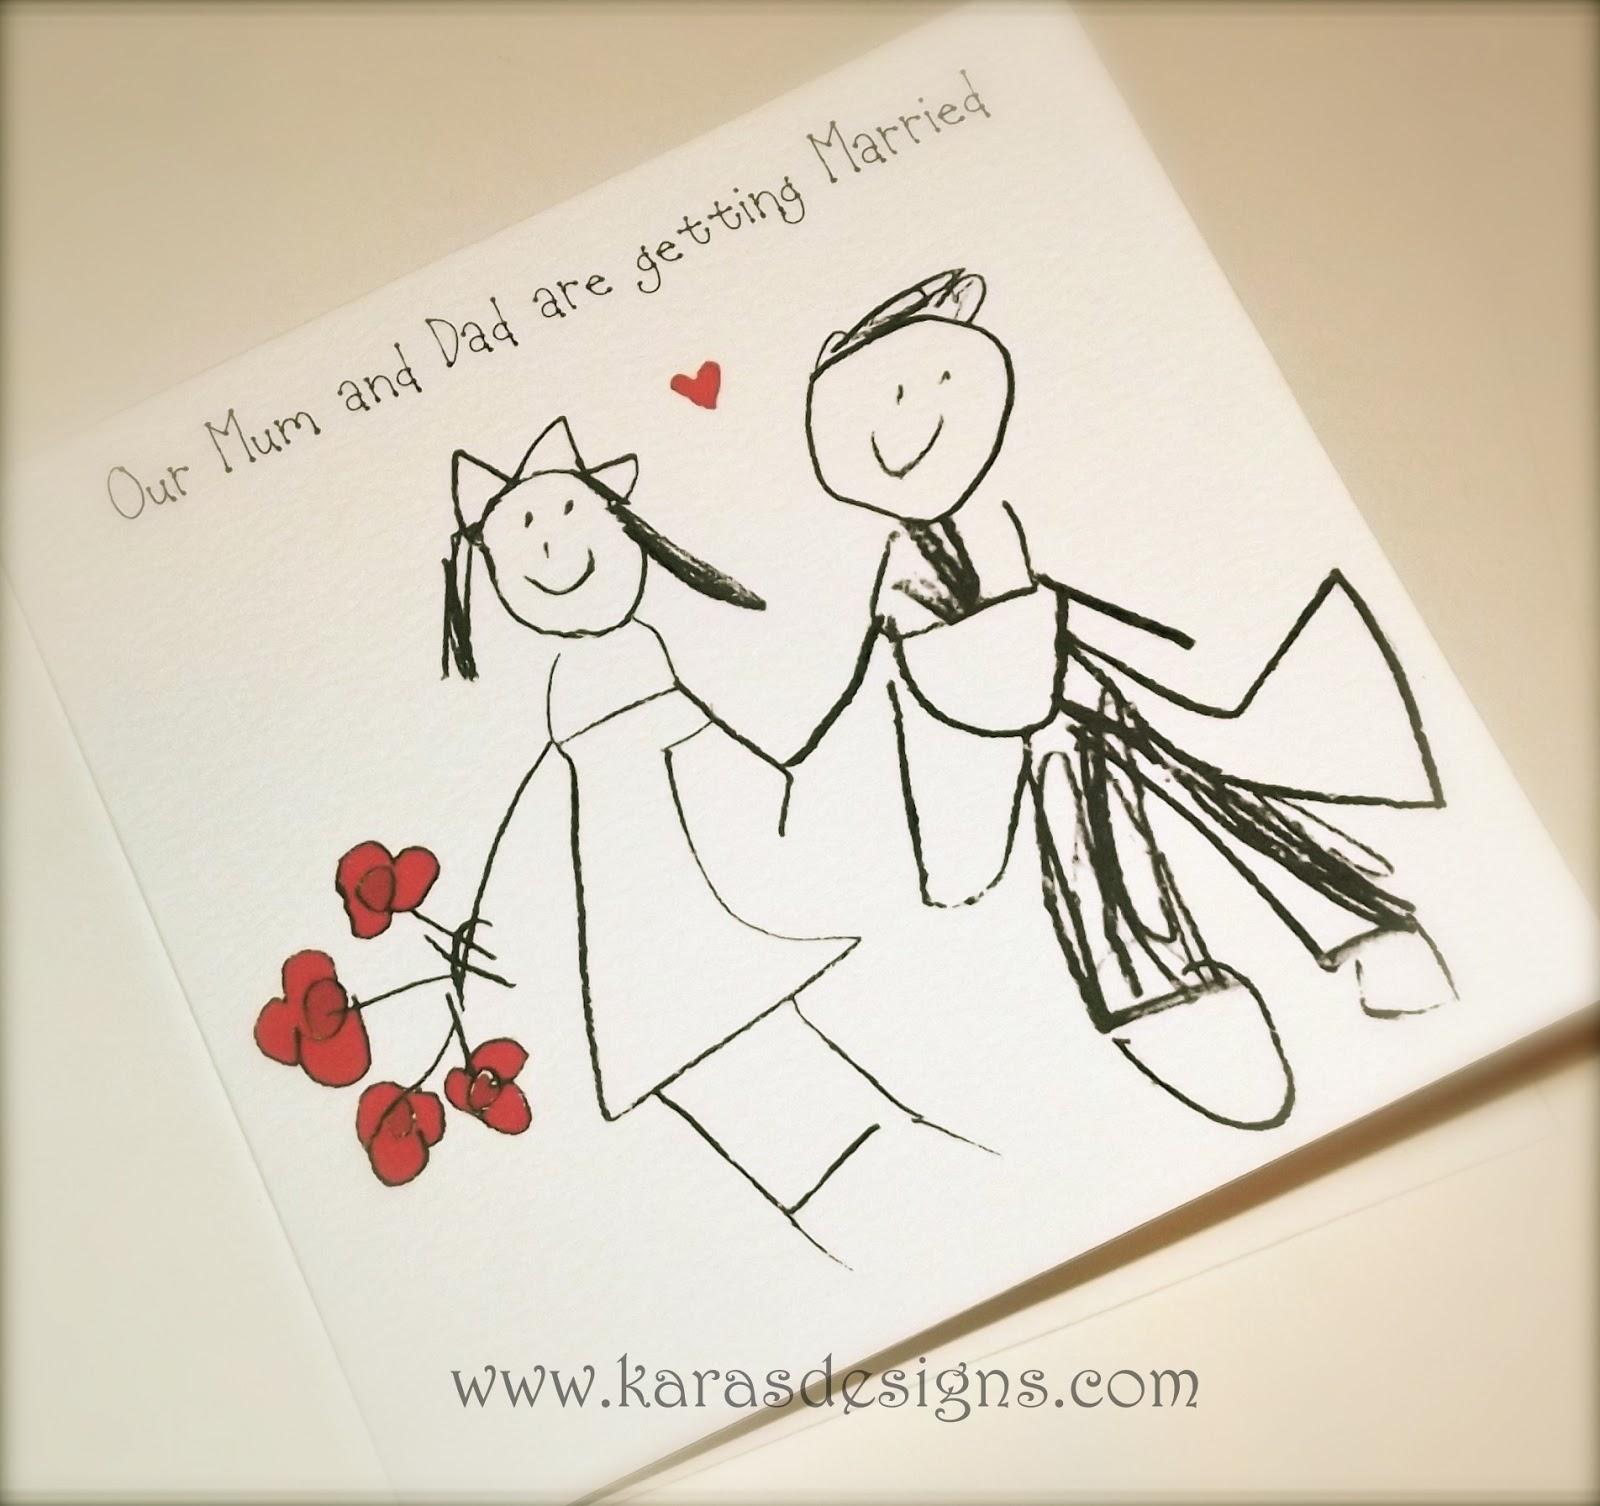 Wwwkarasdesignscom kids drawn wedding invites for Kid free wedding invitations